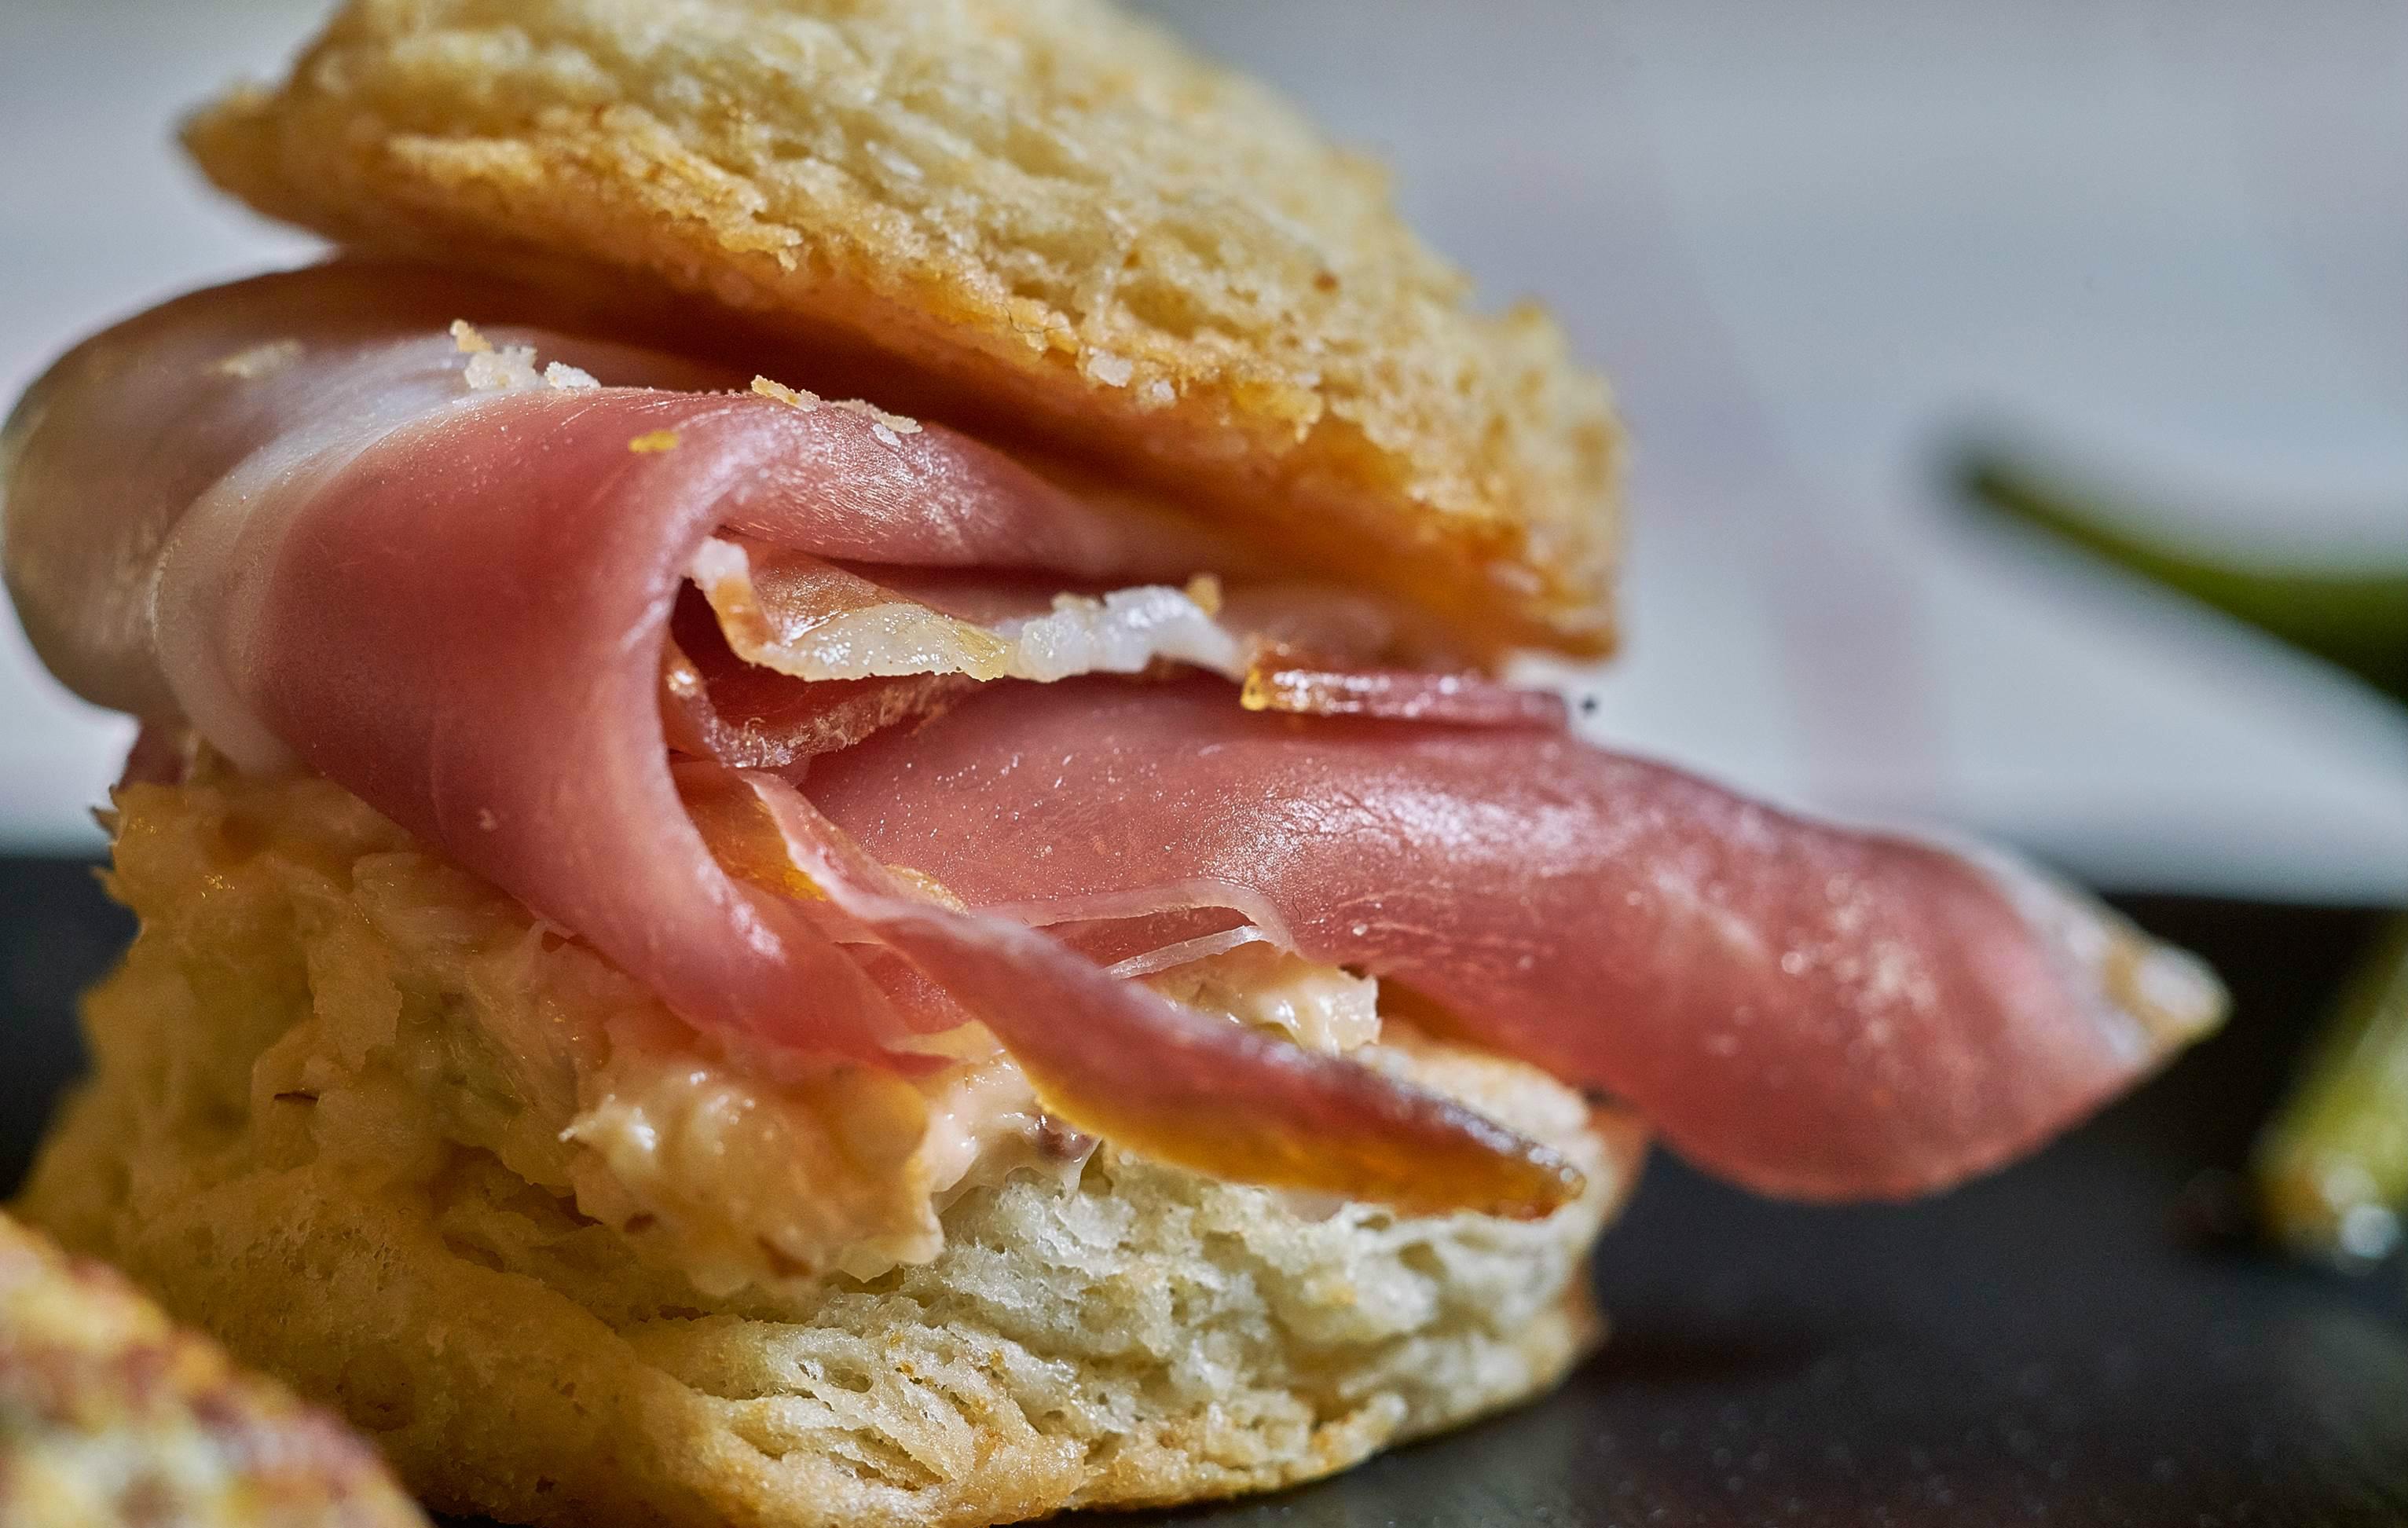 Ham biscuits: Benton's ham, buttermilk biscuits, pimento cheese, Tabasco honey.